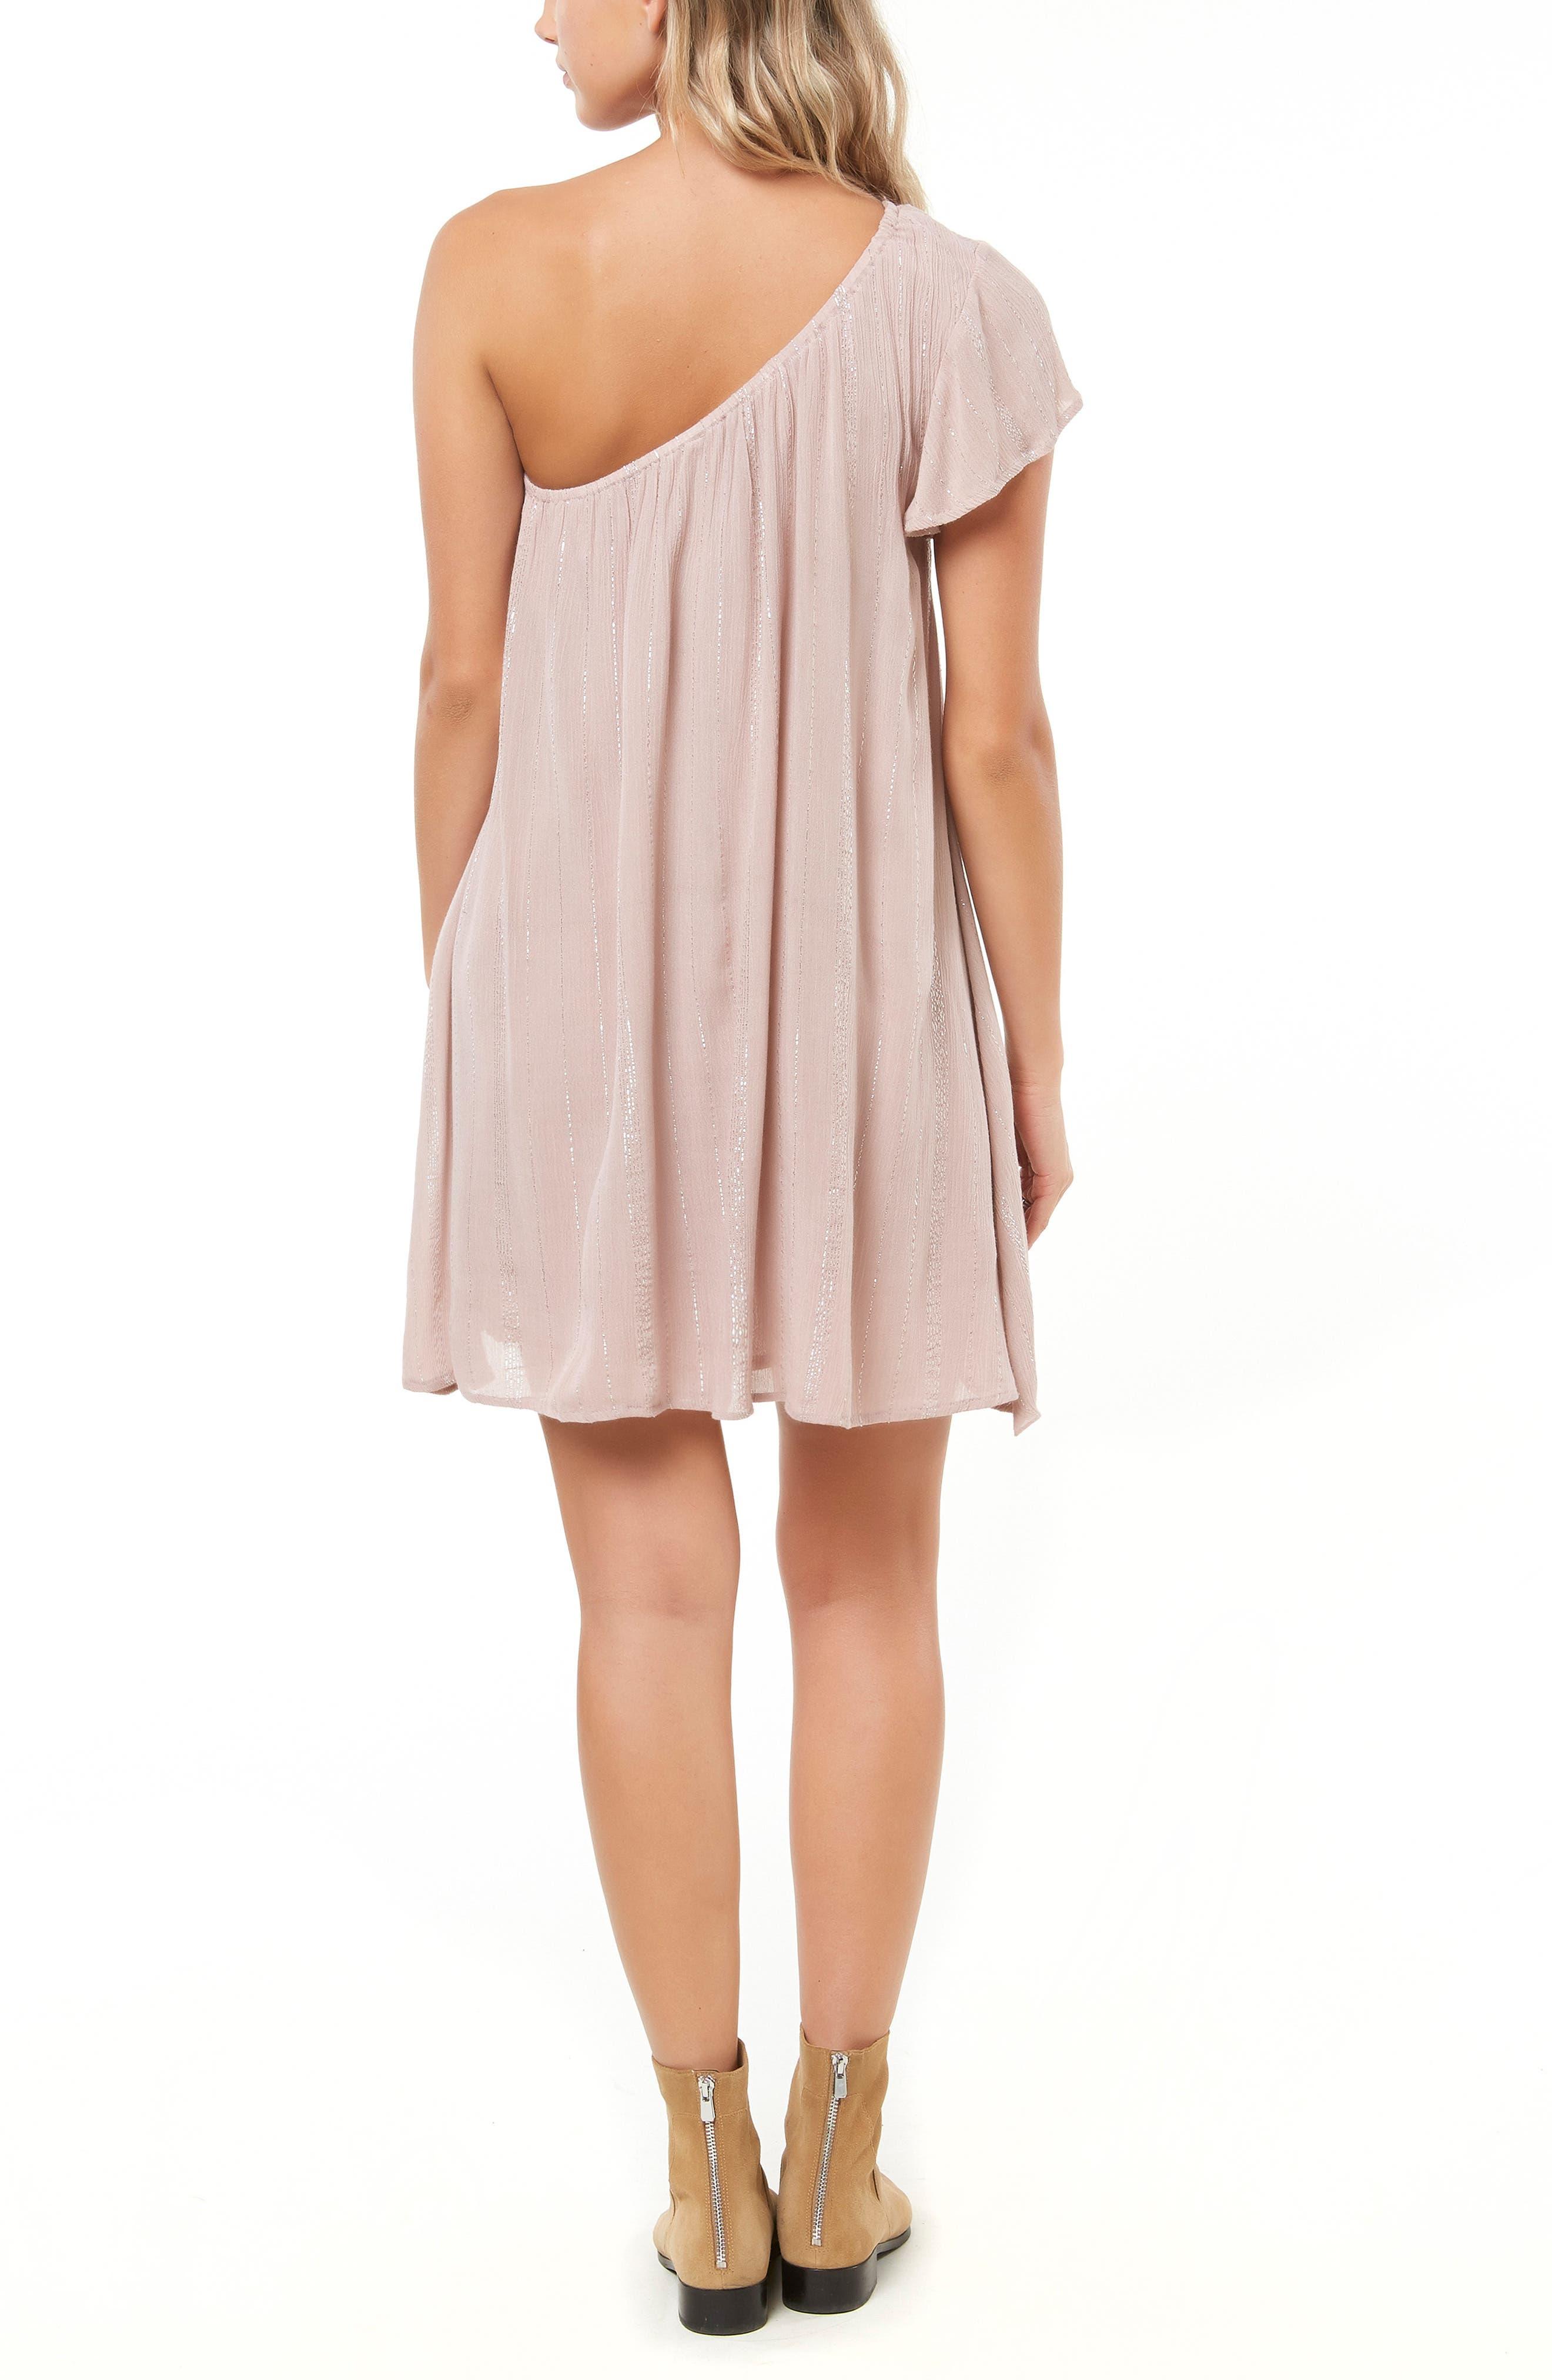 Karma One-Shoulder Dress,                             Alternate thumbnail 2, color,                             FAWN